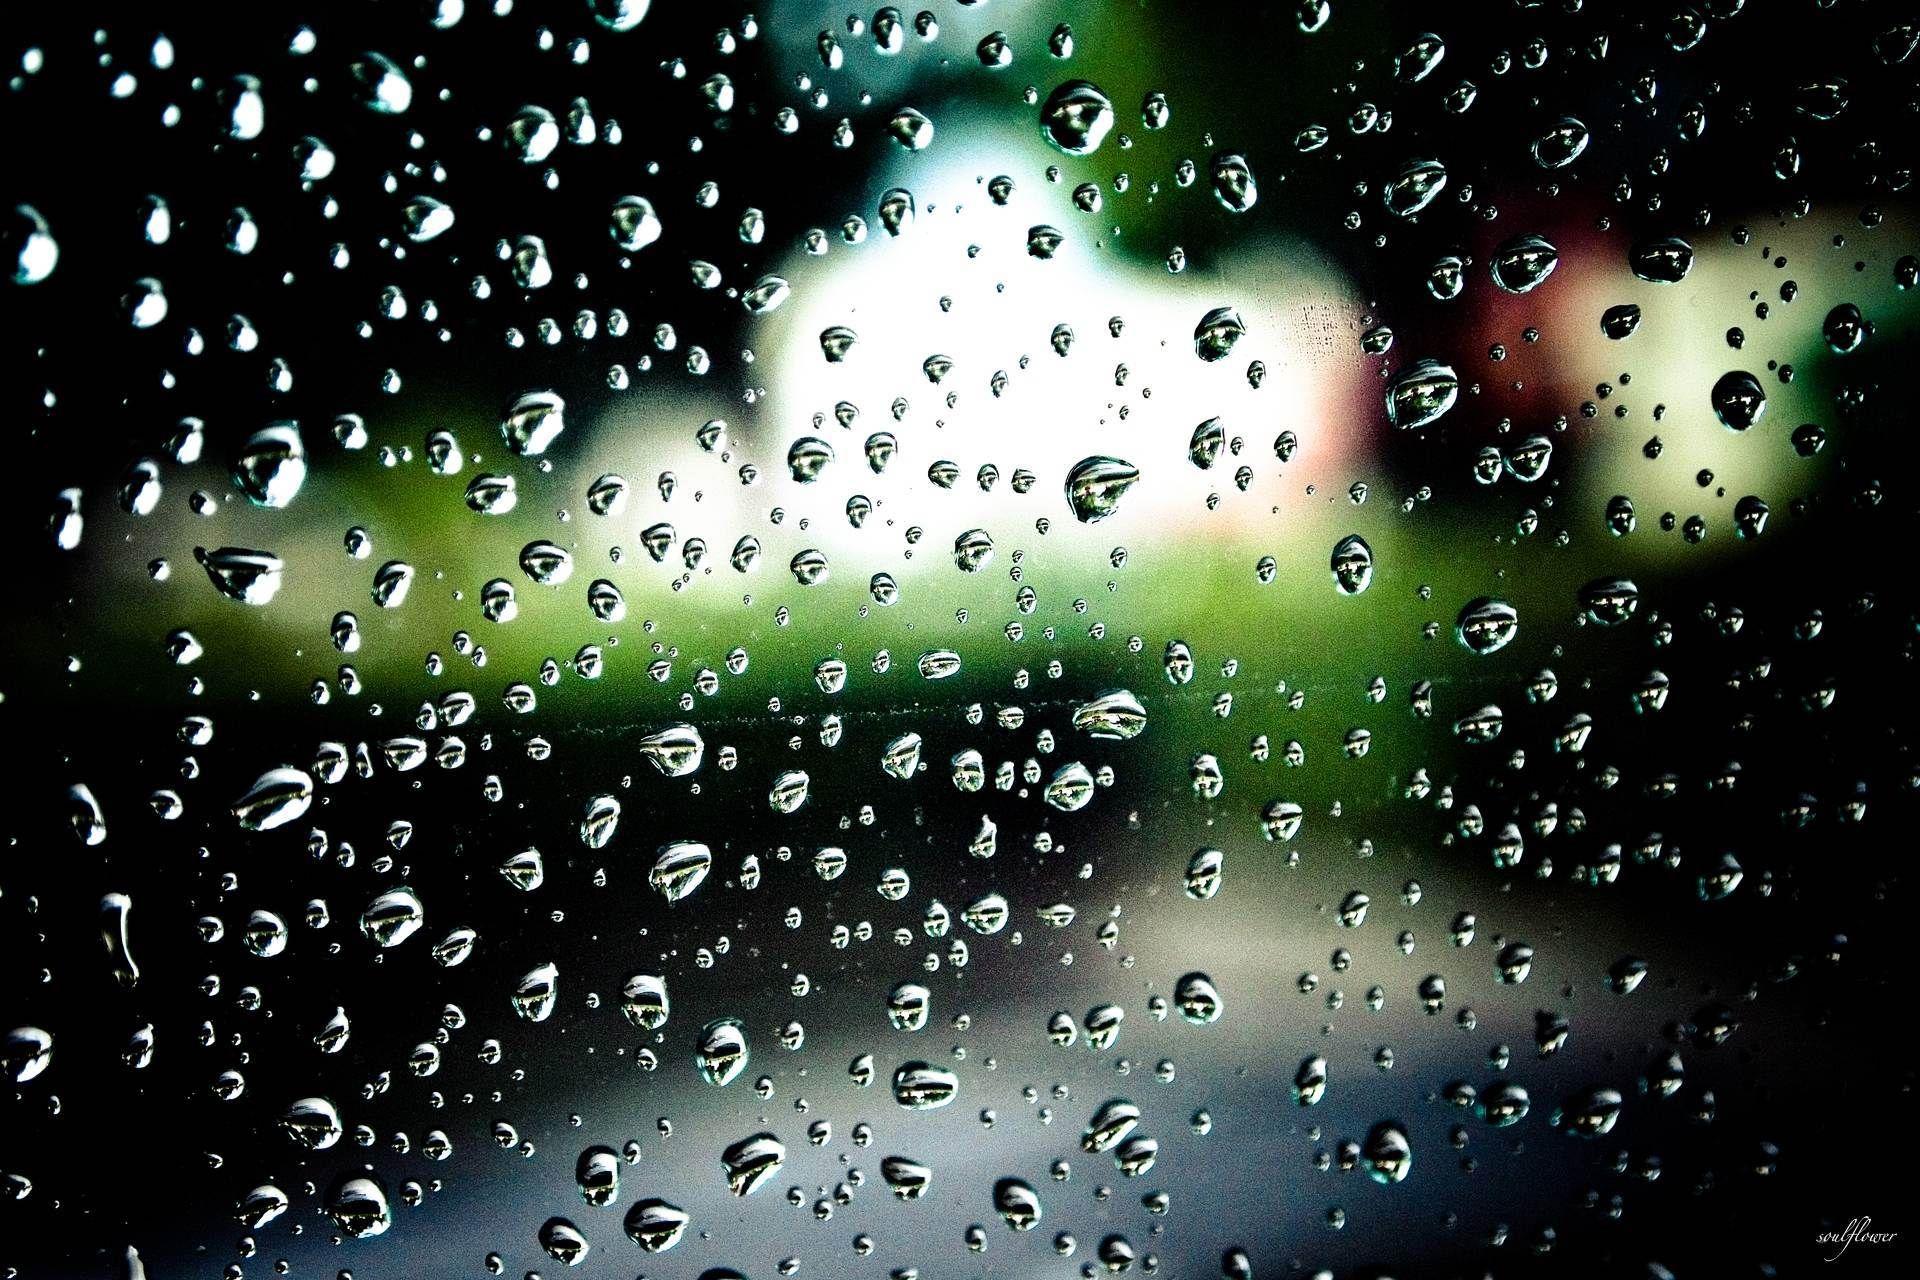 Awesome Beautiful Rain Drop Wallpapers Teorg 1920 1280 Raindrop Wallpapers